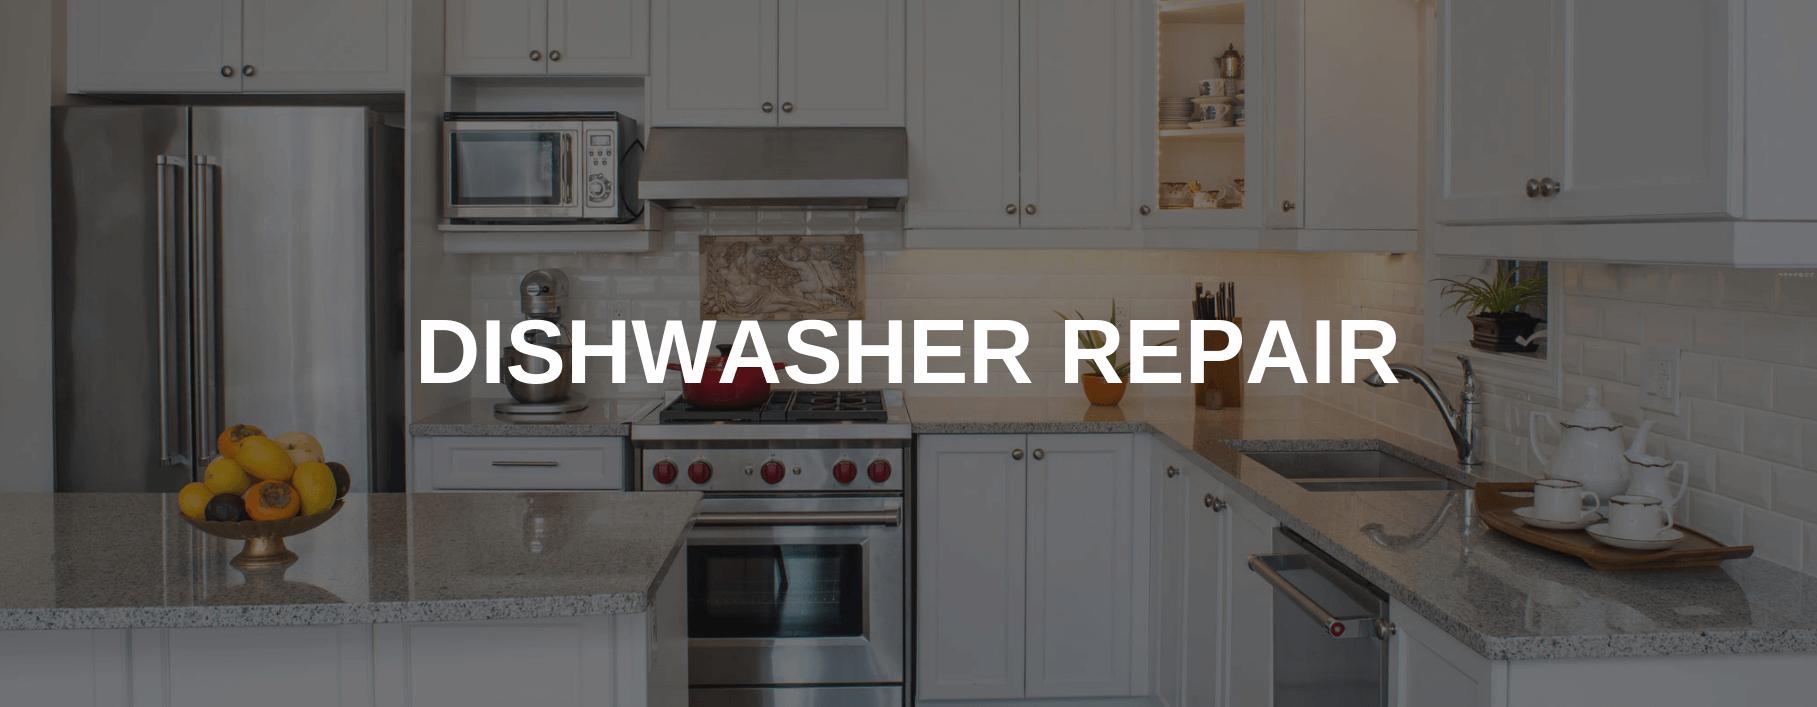 dishwasher repair henderson